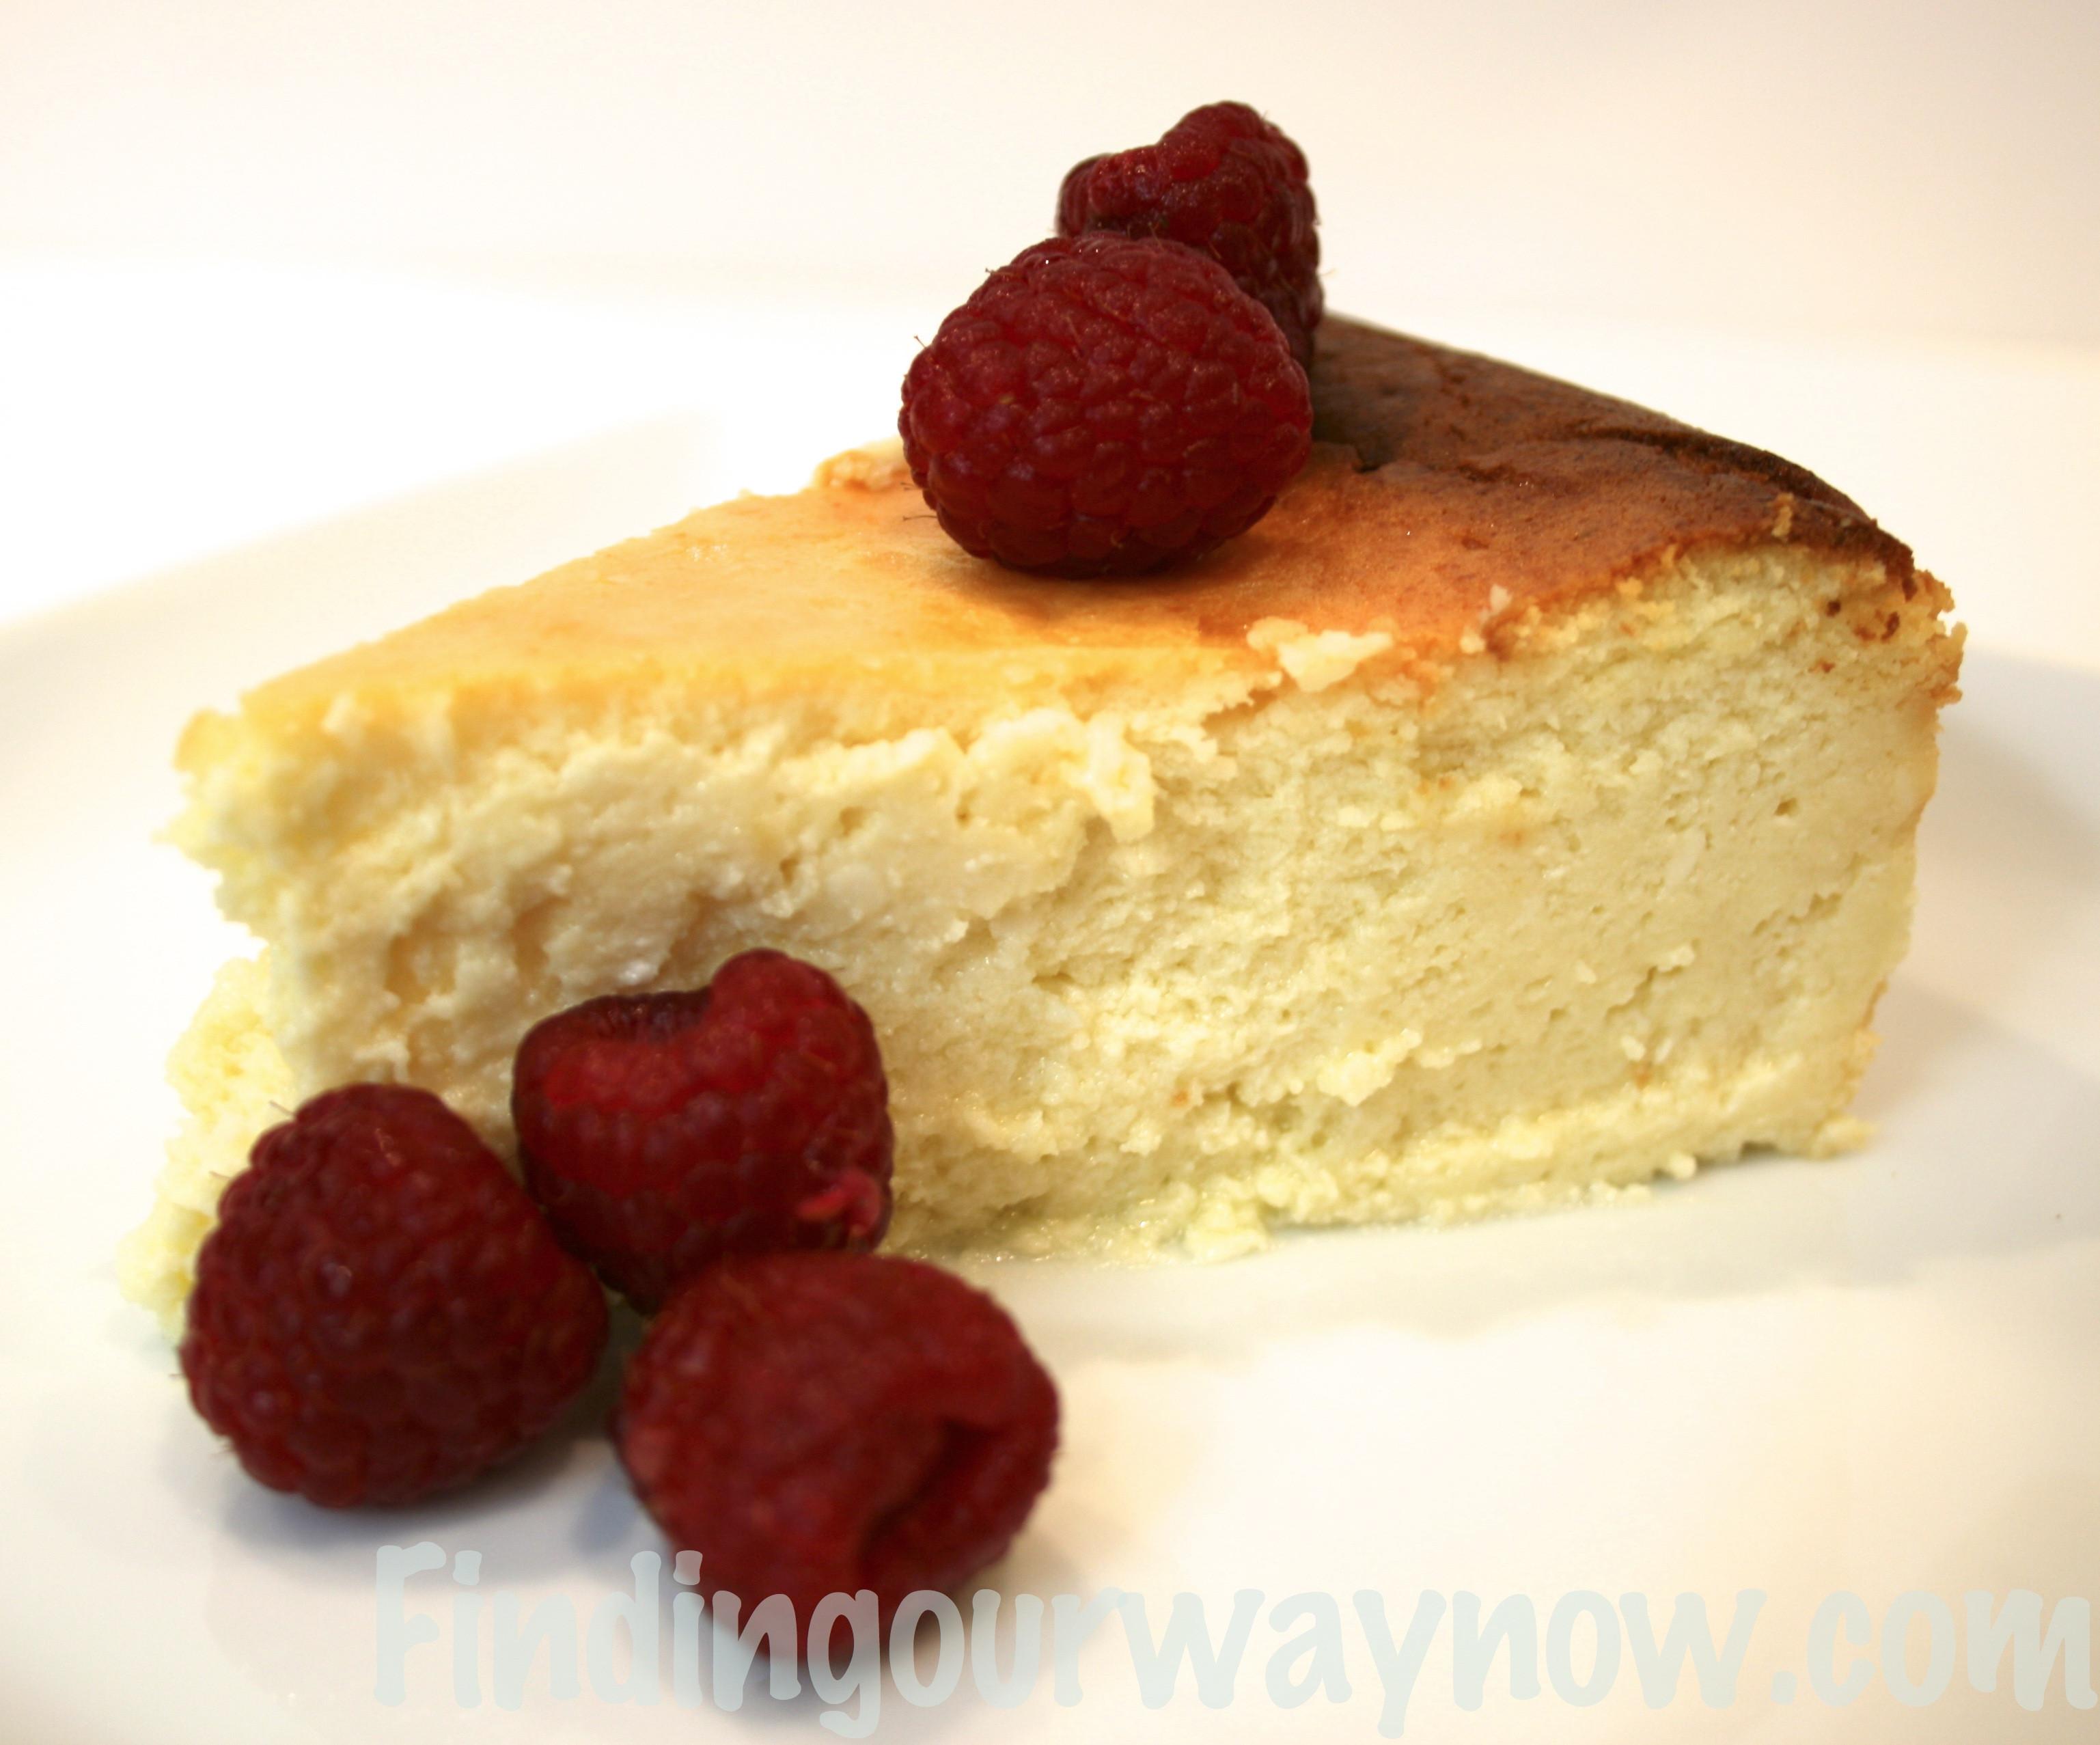 Italian Cheesecake Recipe  Homemade Italian Cheesecake Recipe Finding Our Way Now